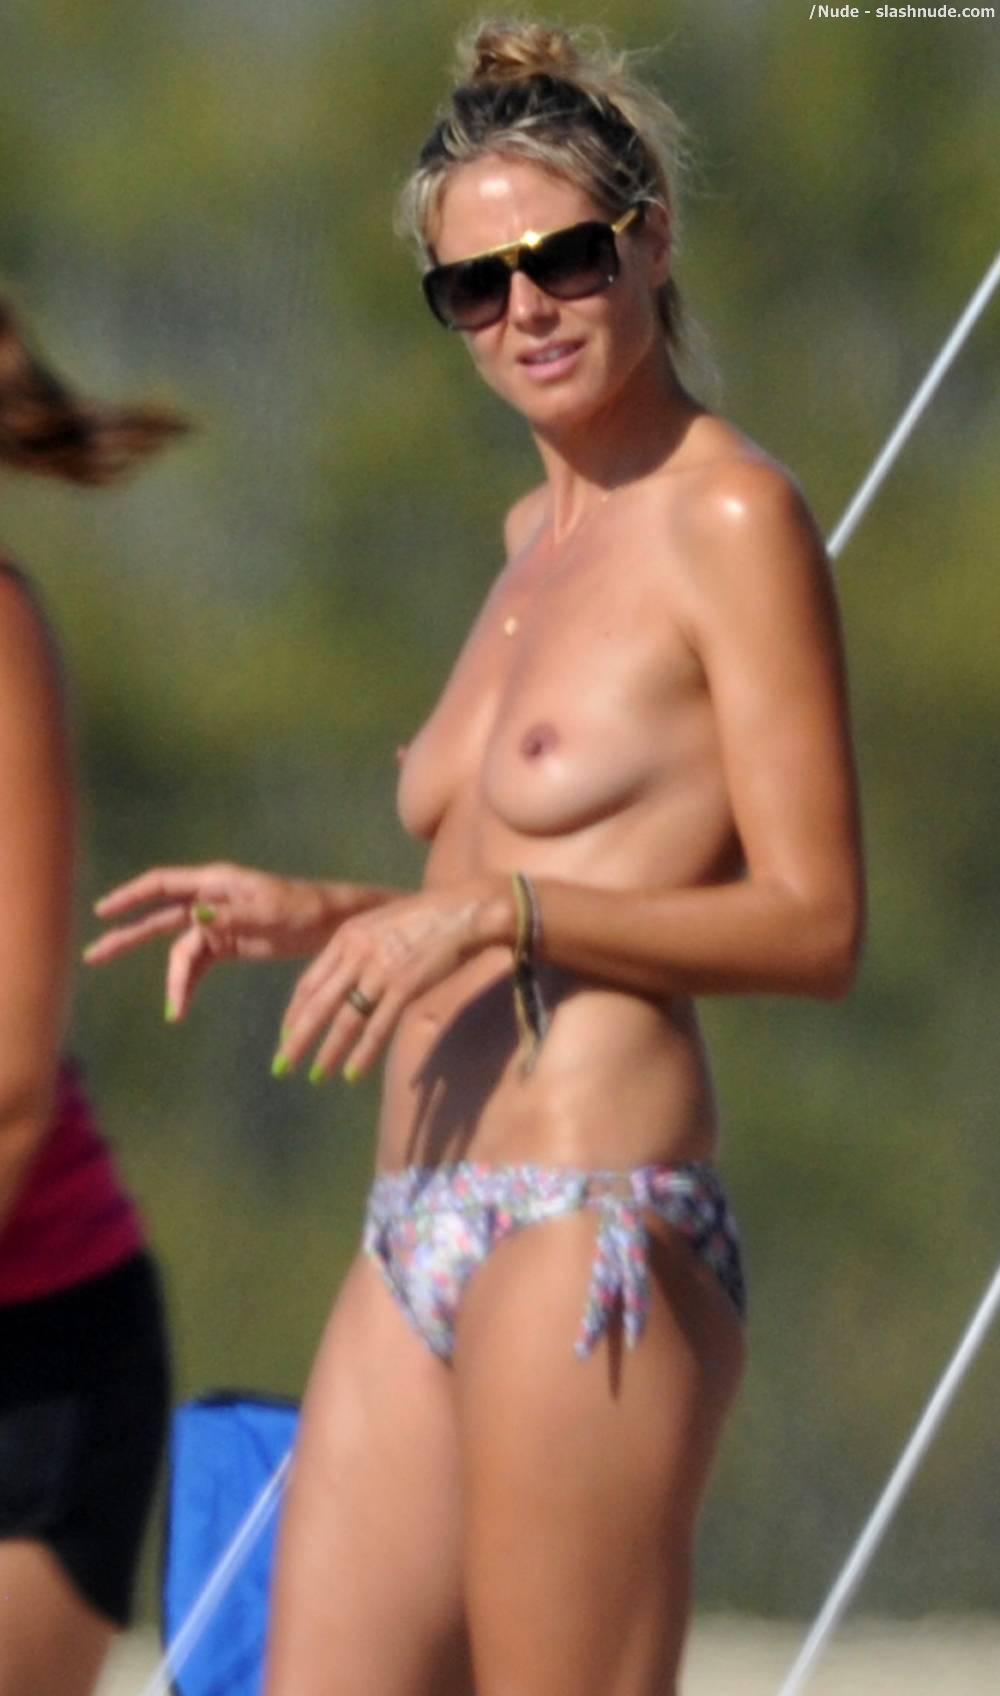 Heidi-Klum-Topless-Beach-Mom-Hard-At-Work-3880-11-8032